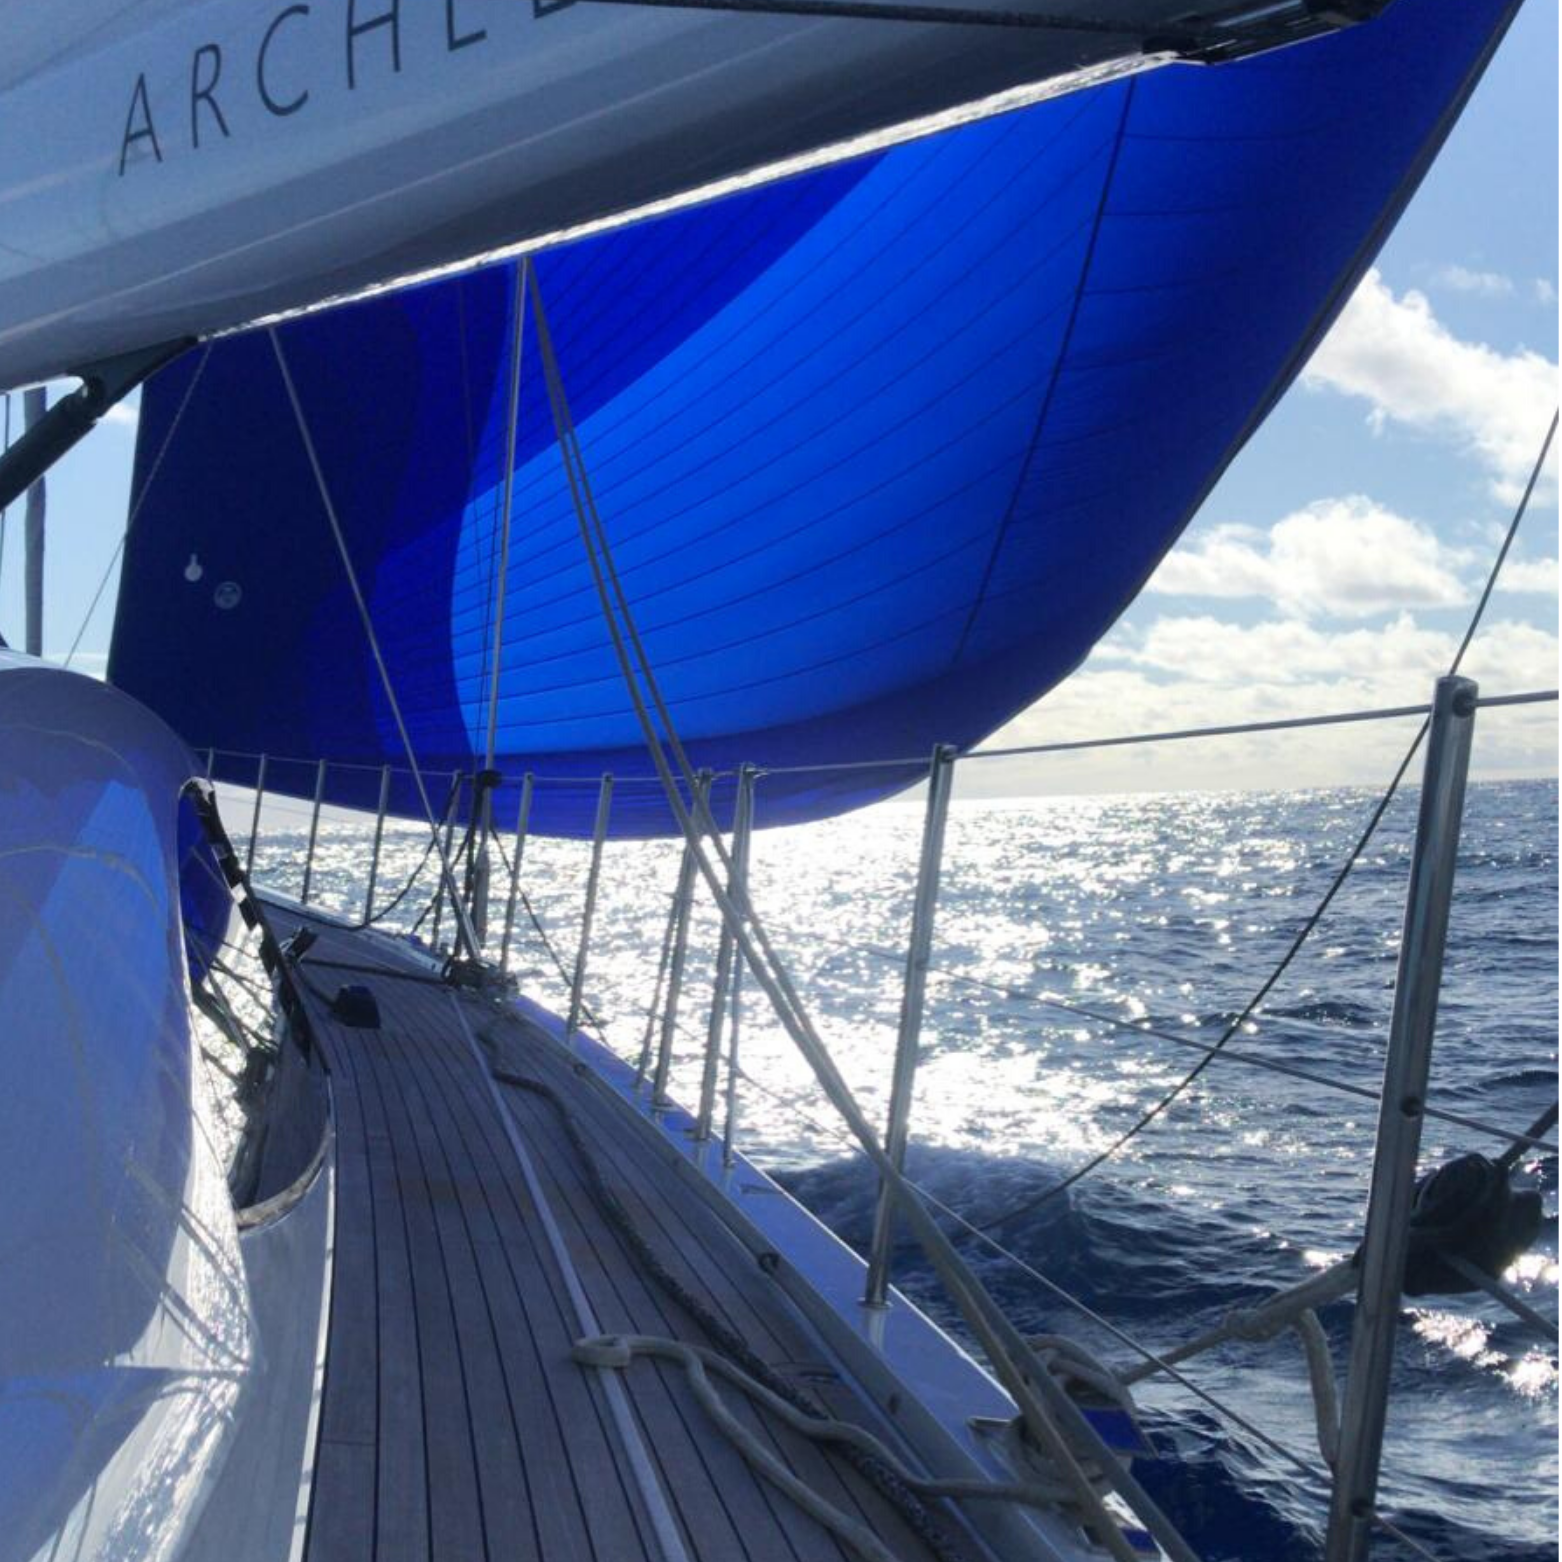 PETES BLOG: Pete takes on the Atlantic (again)!